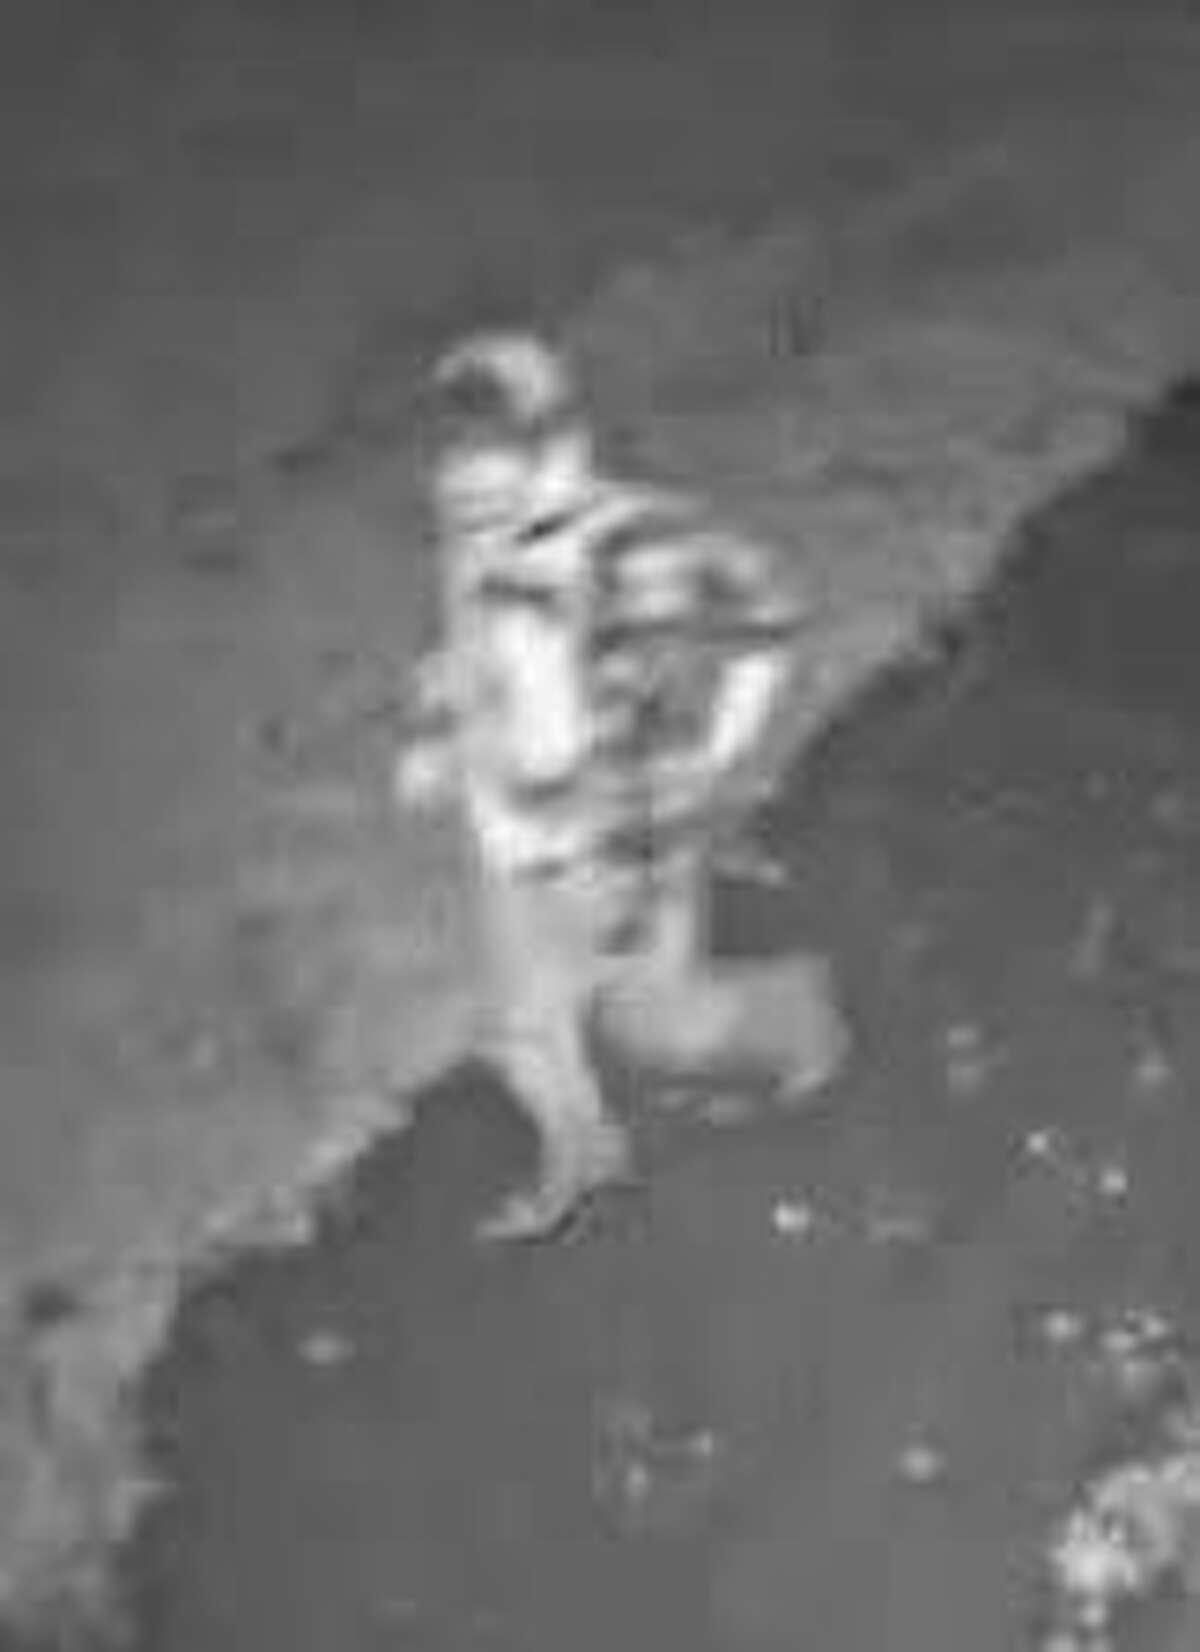 Surveillance photos of the suspected burglar.